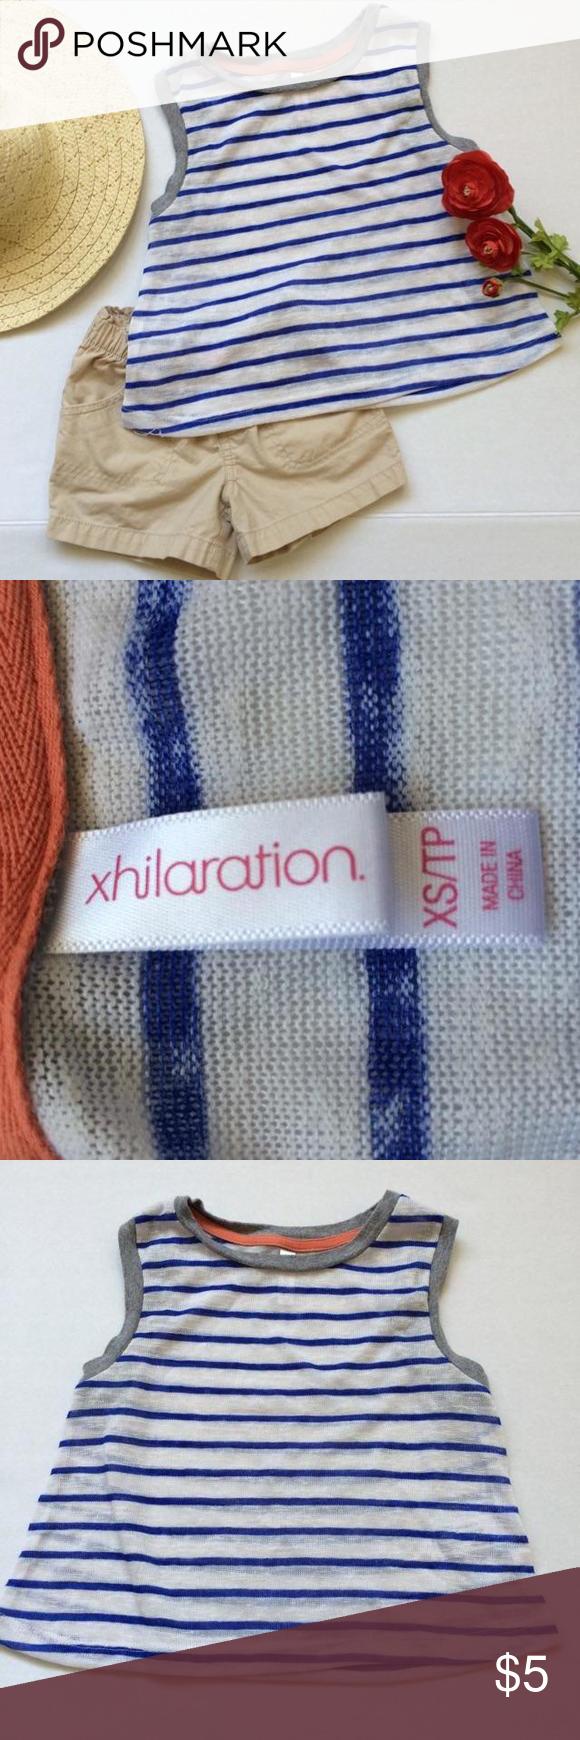 Xhilaration Thin white knit tank with blue stripes    pairs perfectly with khaki shorts NOT included Xhilaration Dresses